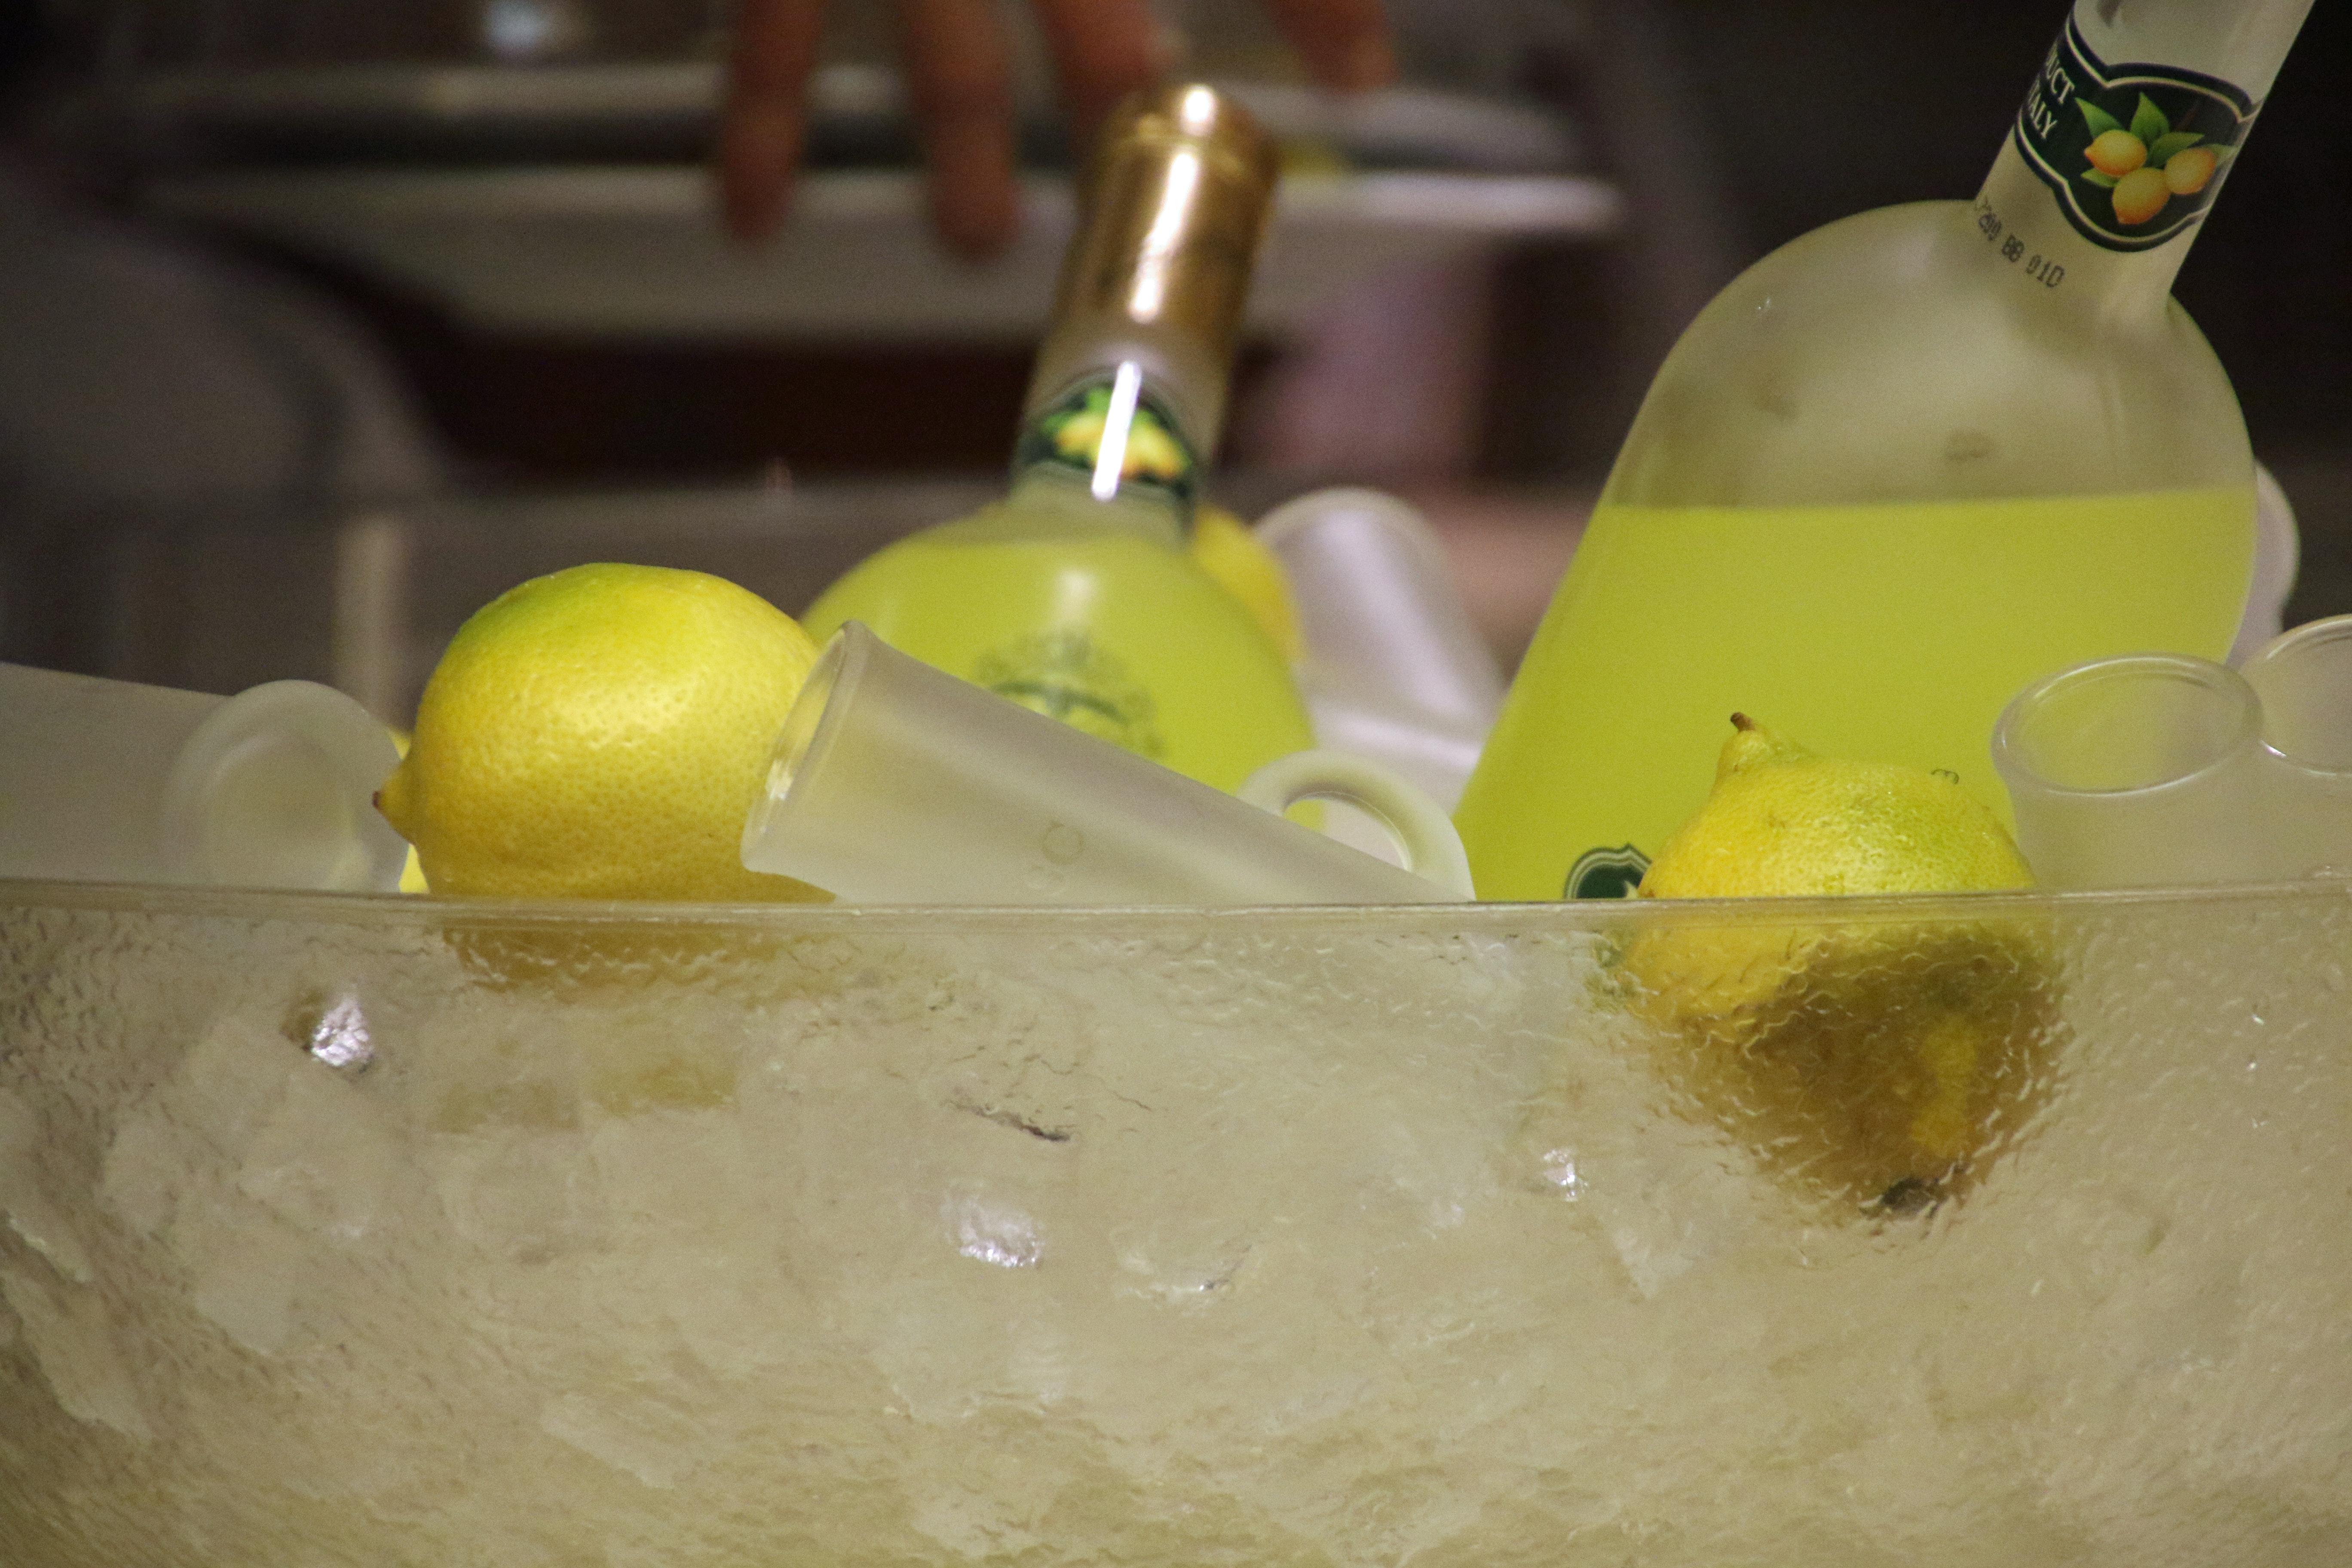 Bottles of lemon beverage in the ice photo